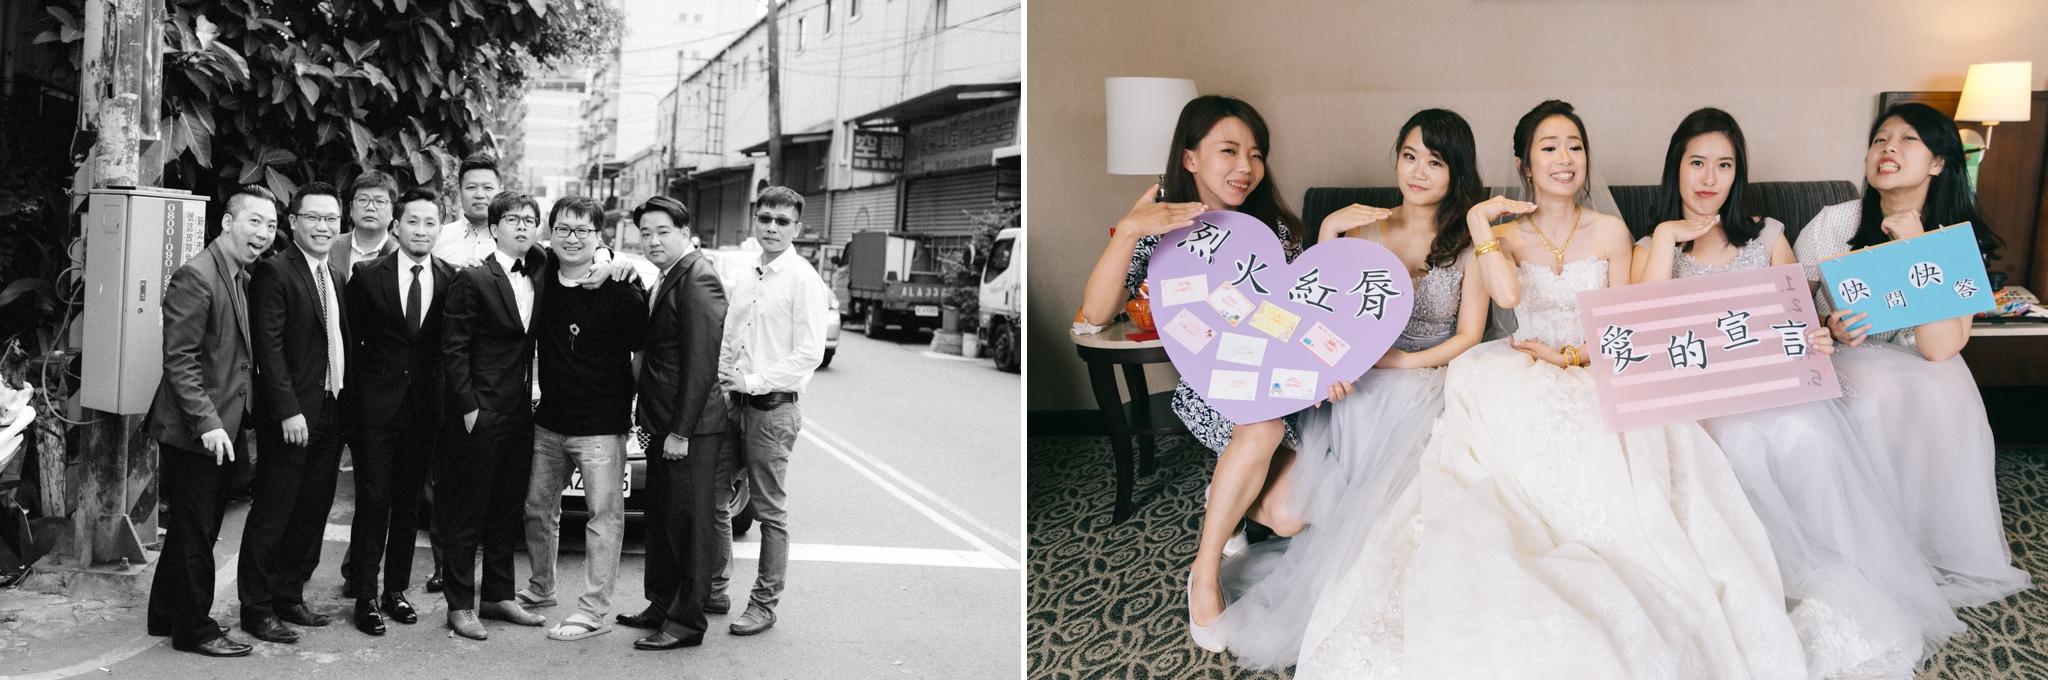 Tina+Nash-wedding-台北婚禮迎娶晚宴-新莊終身大事-016.jpg